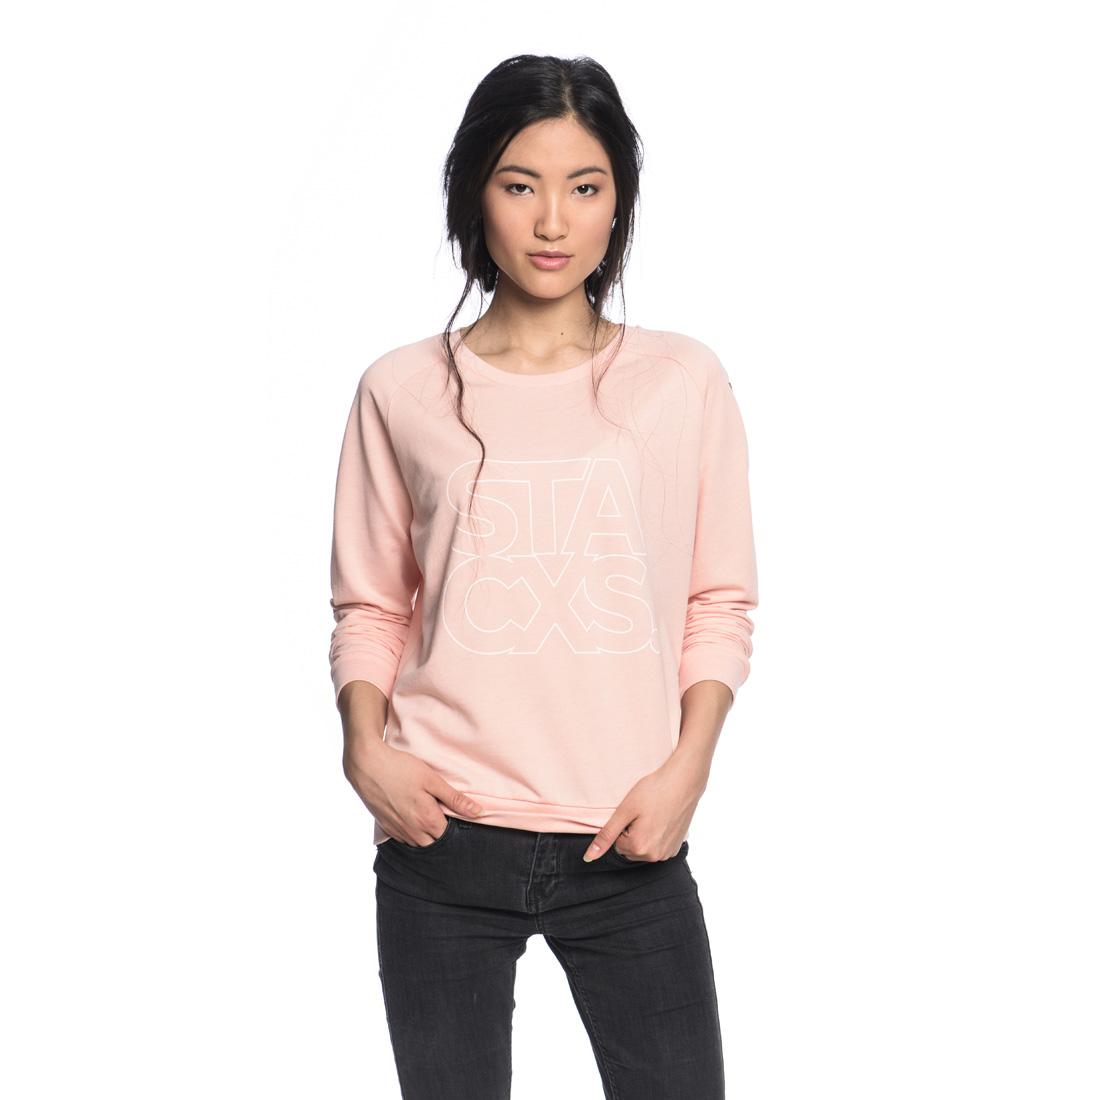 Outline Logo von Stacxs - Girlie Sweater jetzt im Stacxs Shop Shop